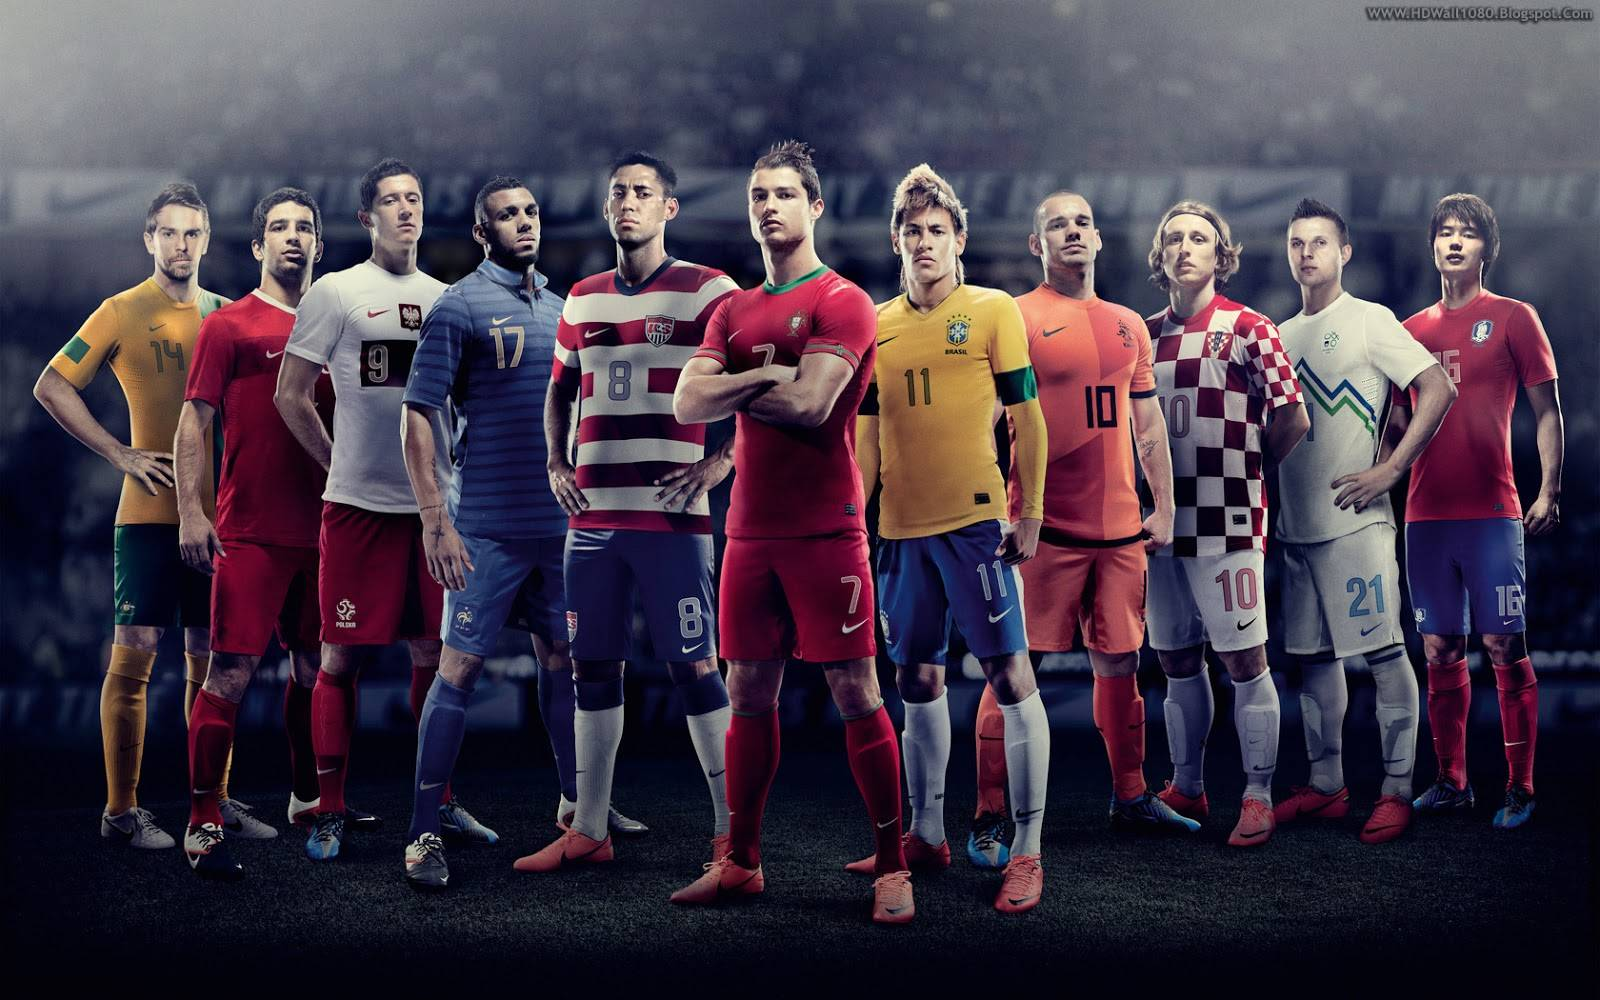 team FIFA image